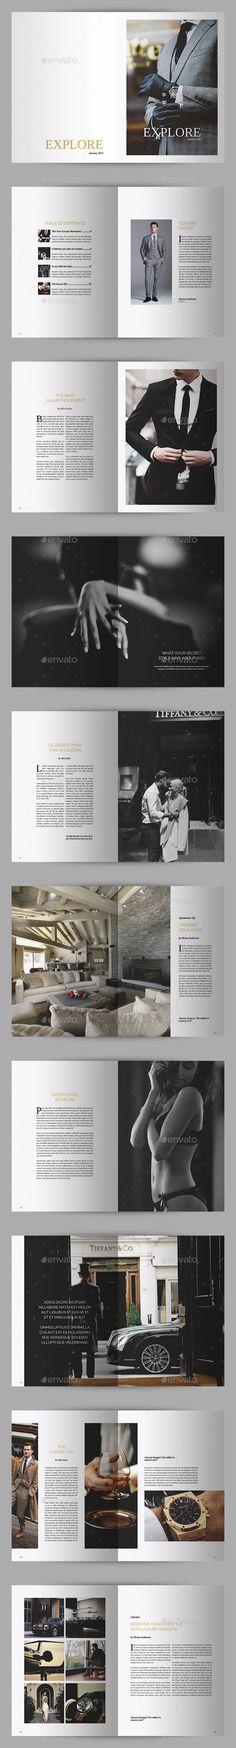 Explore Luxury Magazine Template | #magazinetemplate | Download: http://graphicriver.net/item/explore-luxury-magazine/9895139?ref=ksioks